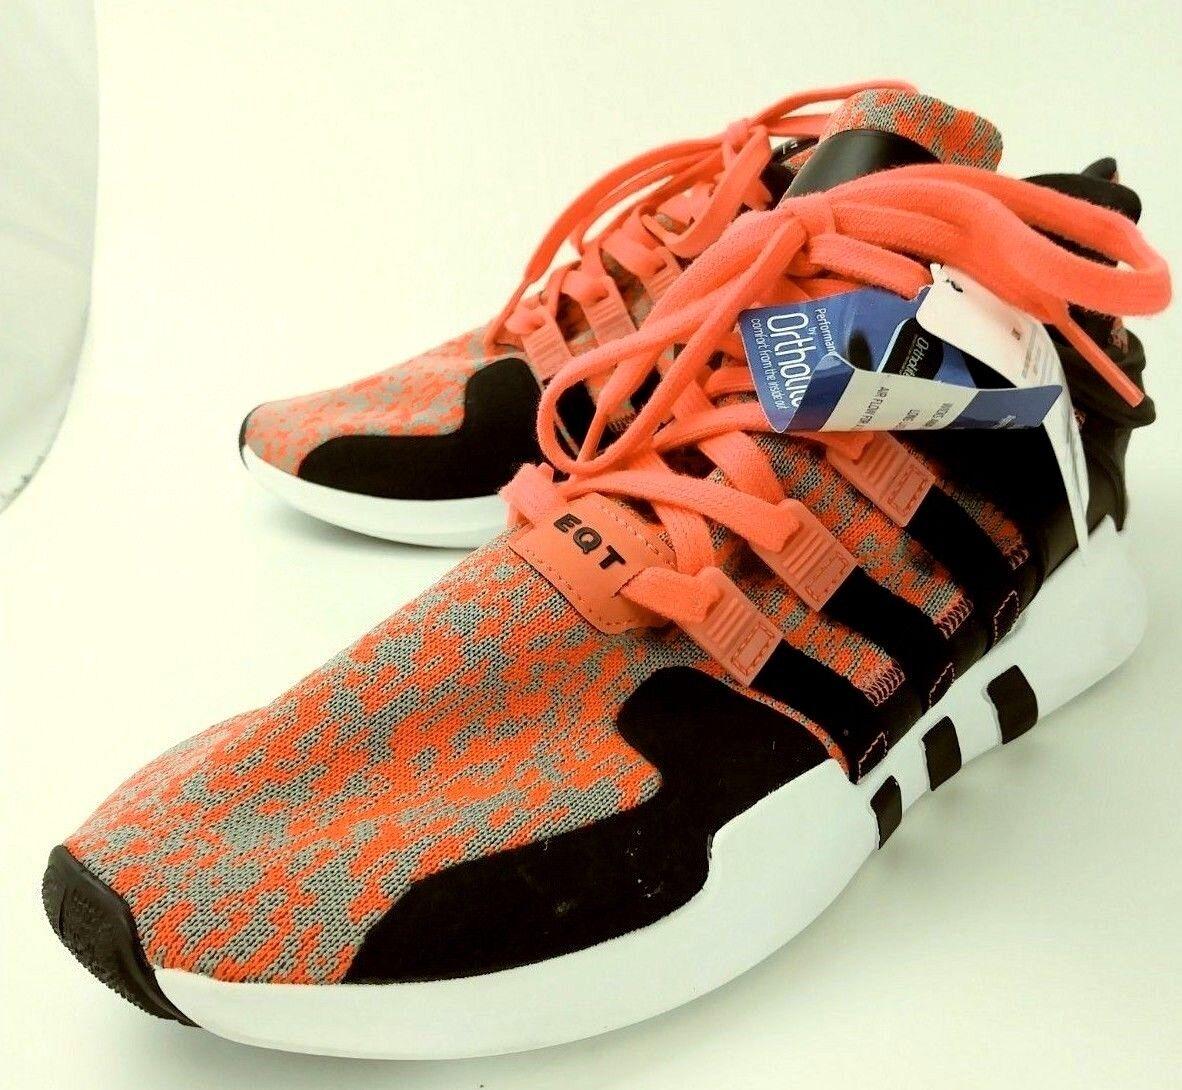 best loved b44d7 32a60 Adidas Adidas Adidas Mens 11.5 Sneakers Equipment ADV 91-16 APE 779001  Orange Gray Black